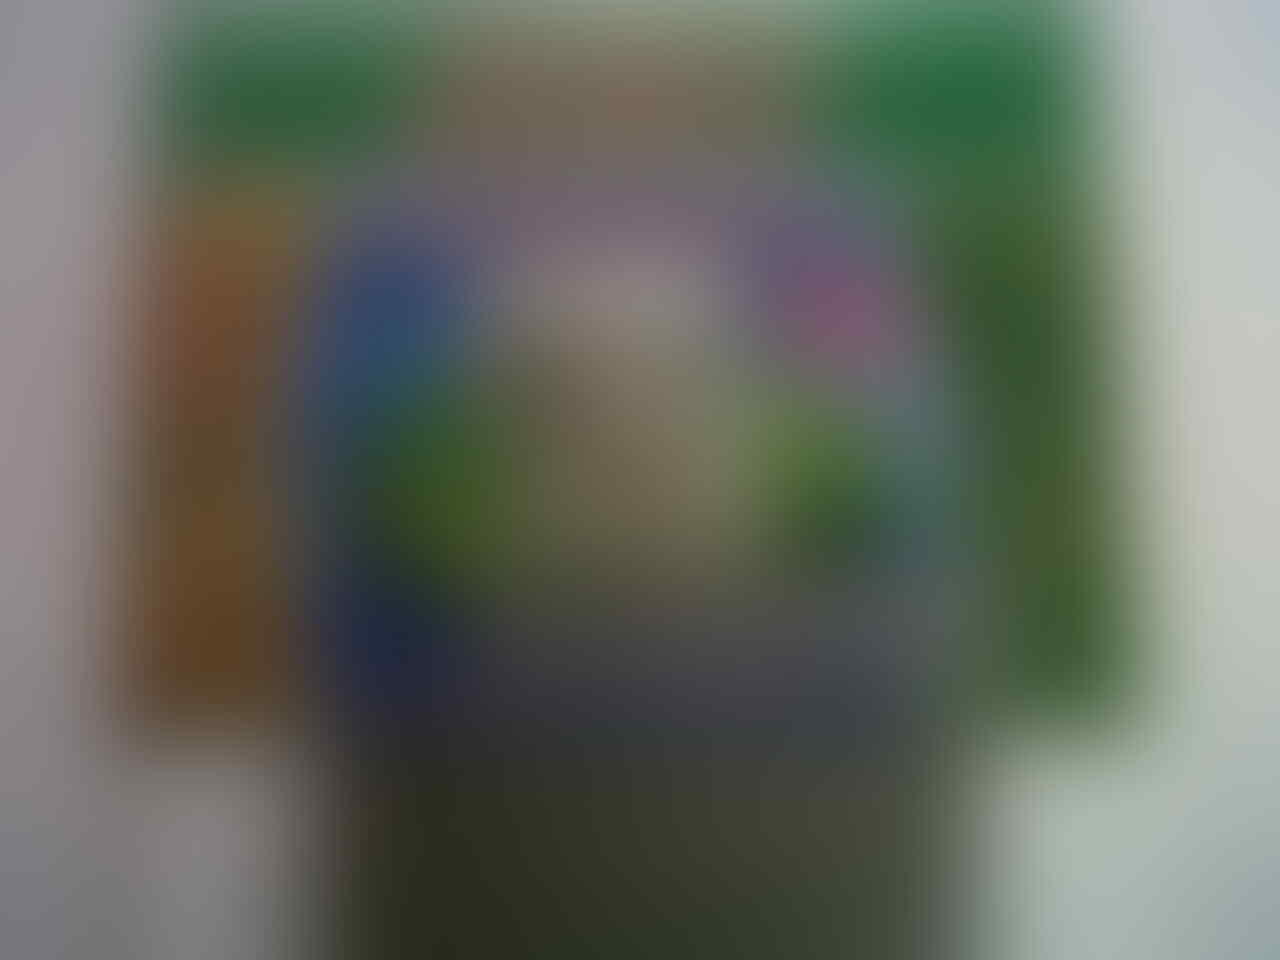 Terjual Fatih Aquarium Gex Perlengkapan Aquascape Kaskus Nikita Size L Ukuran 40 X 25 28cm